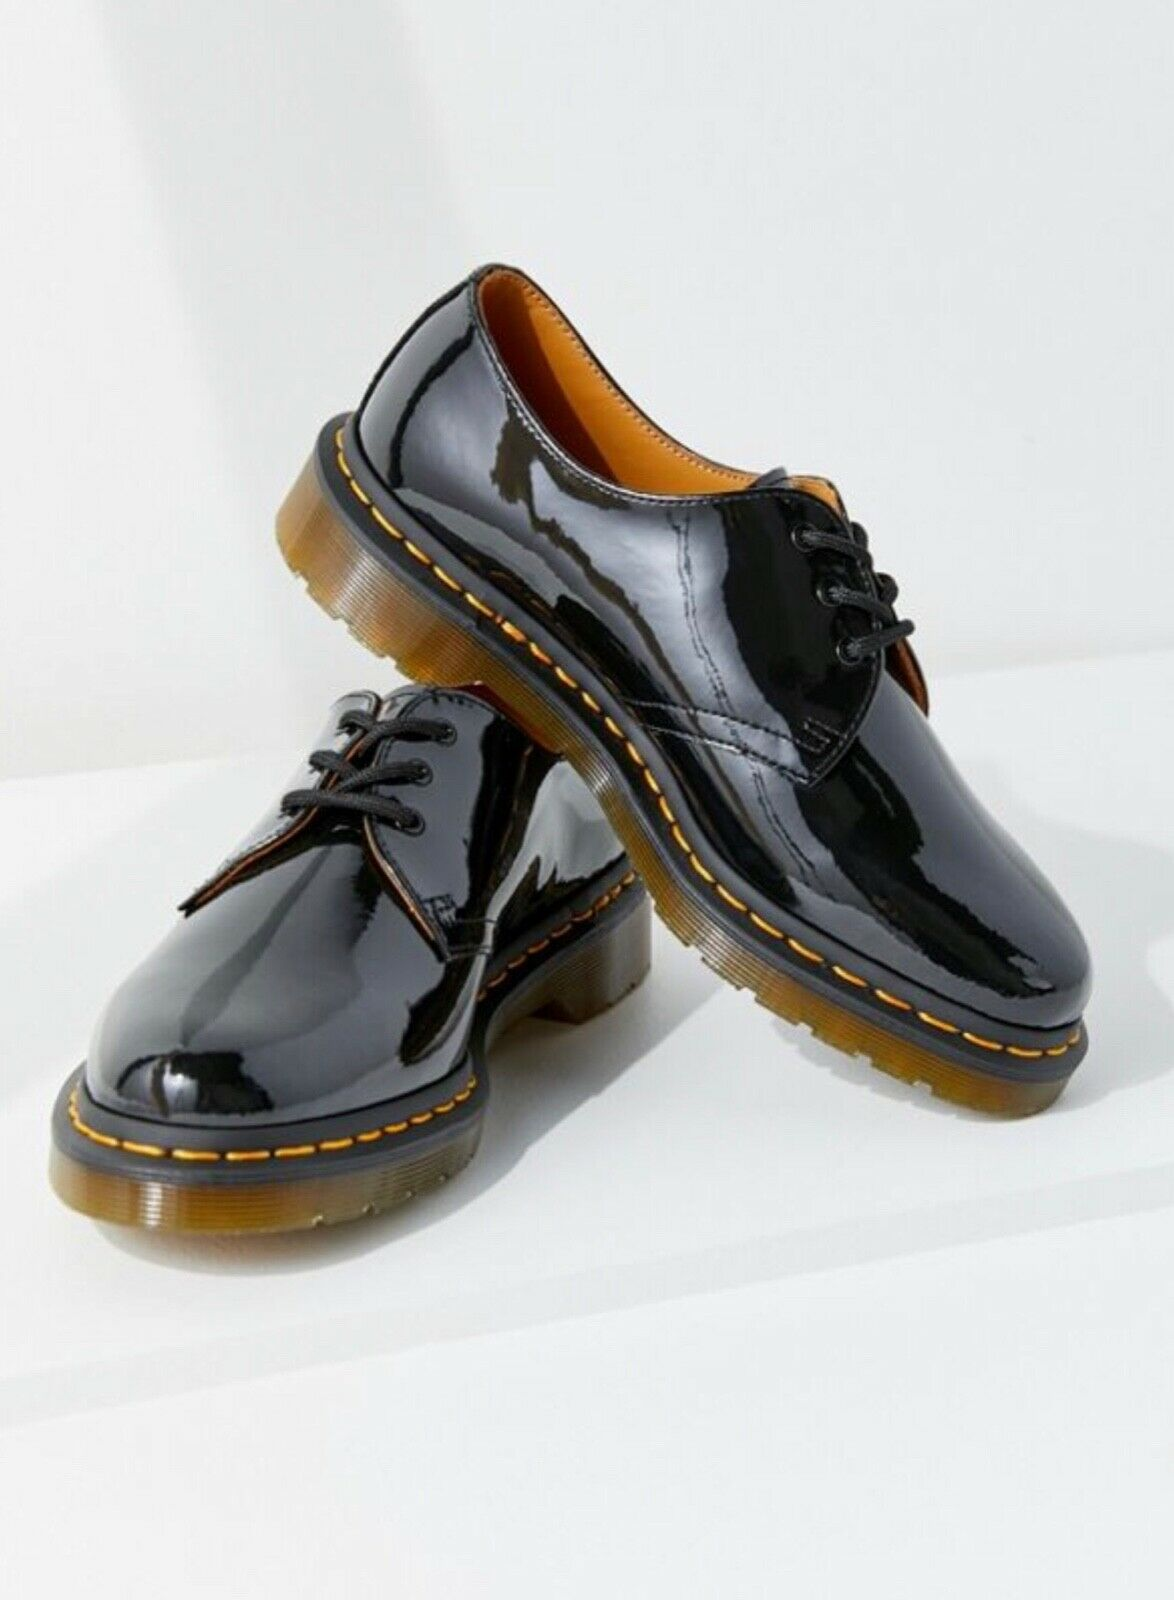 NEW Dr. Dr. Dr. Martens 1461 Patent 3-Eye Oxfords Size 6 US 4 UK 37 EU Black Leather c4a7b4